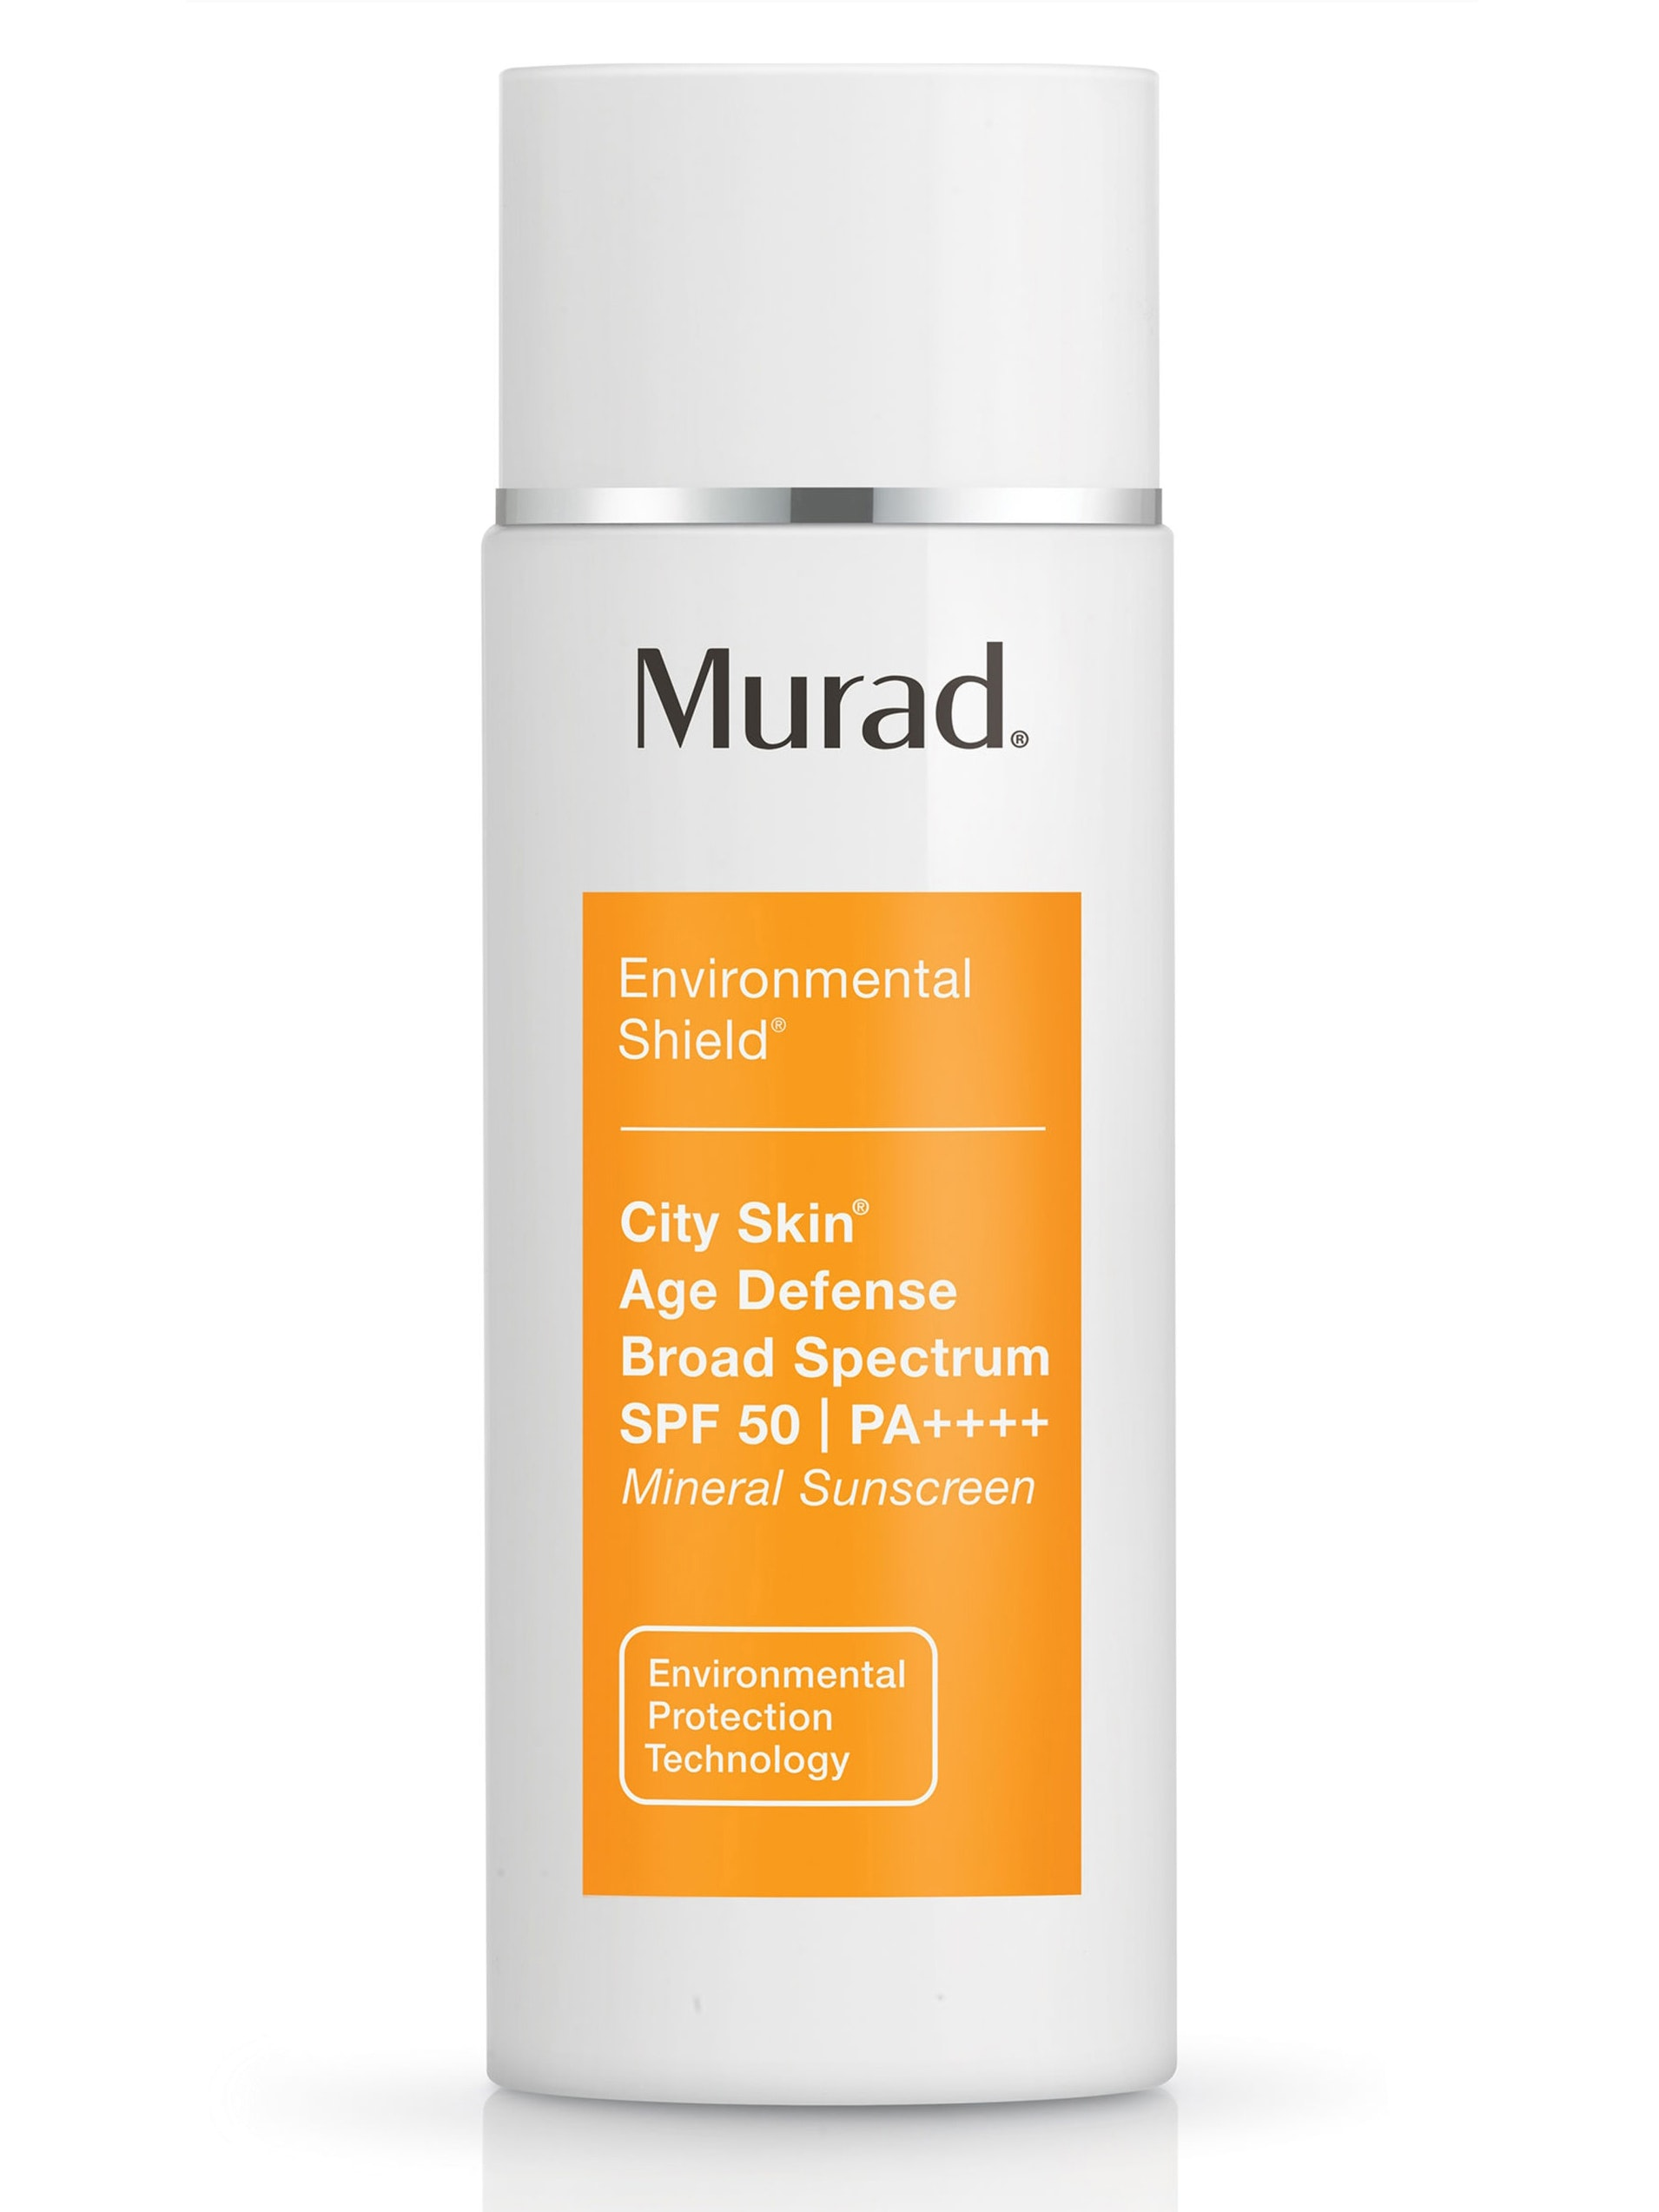 Murad City Skin Age Defense Broad Spectrum SPF 50 PA+++